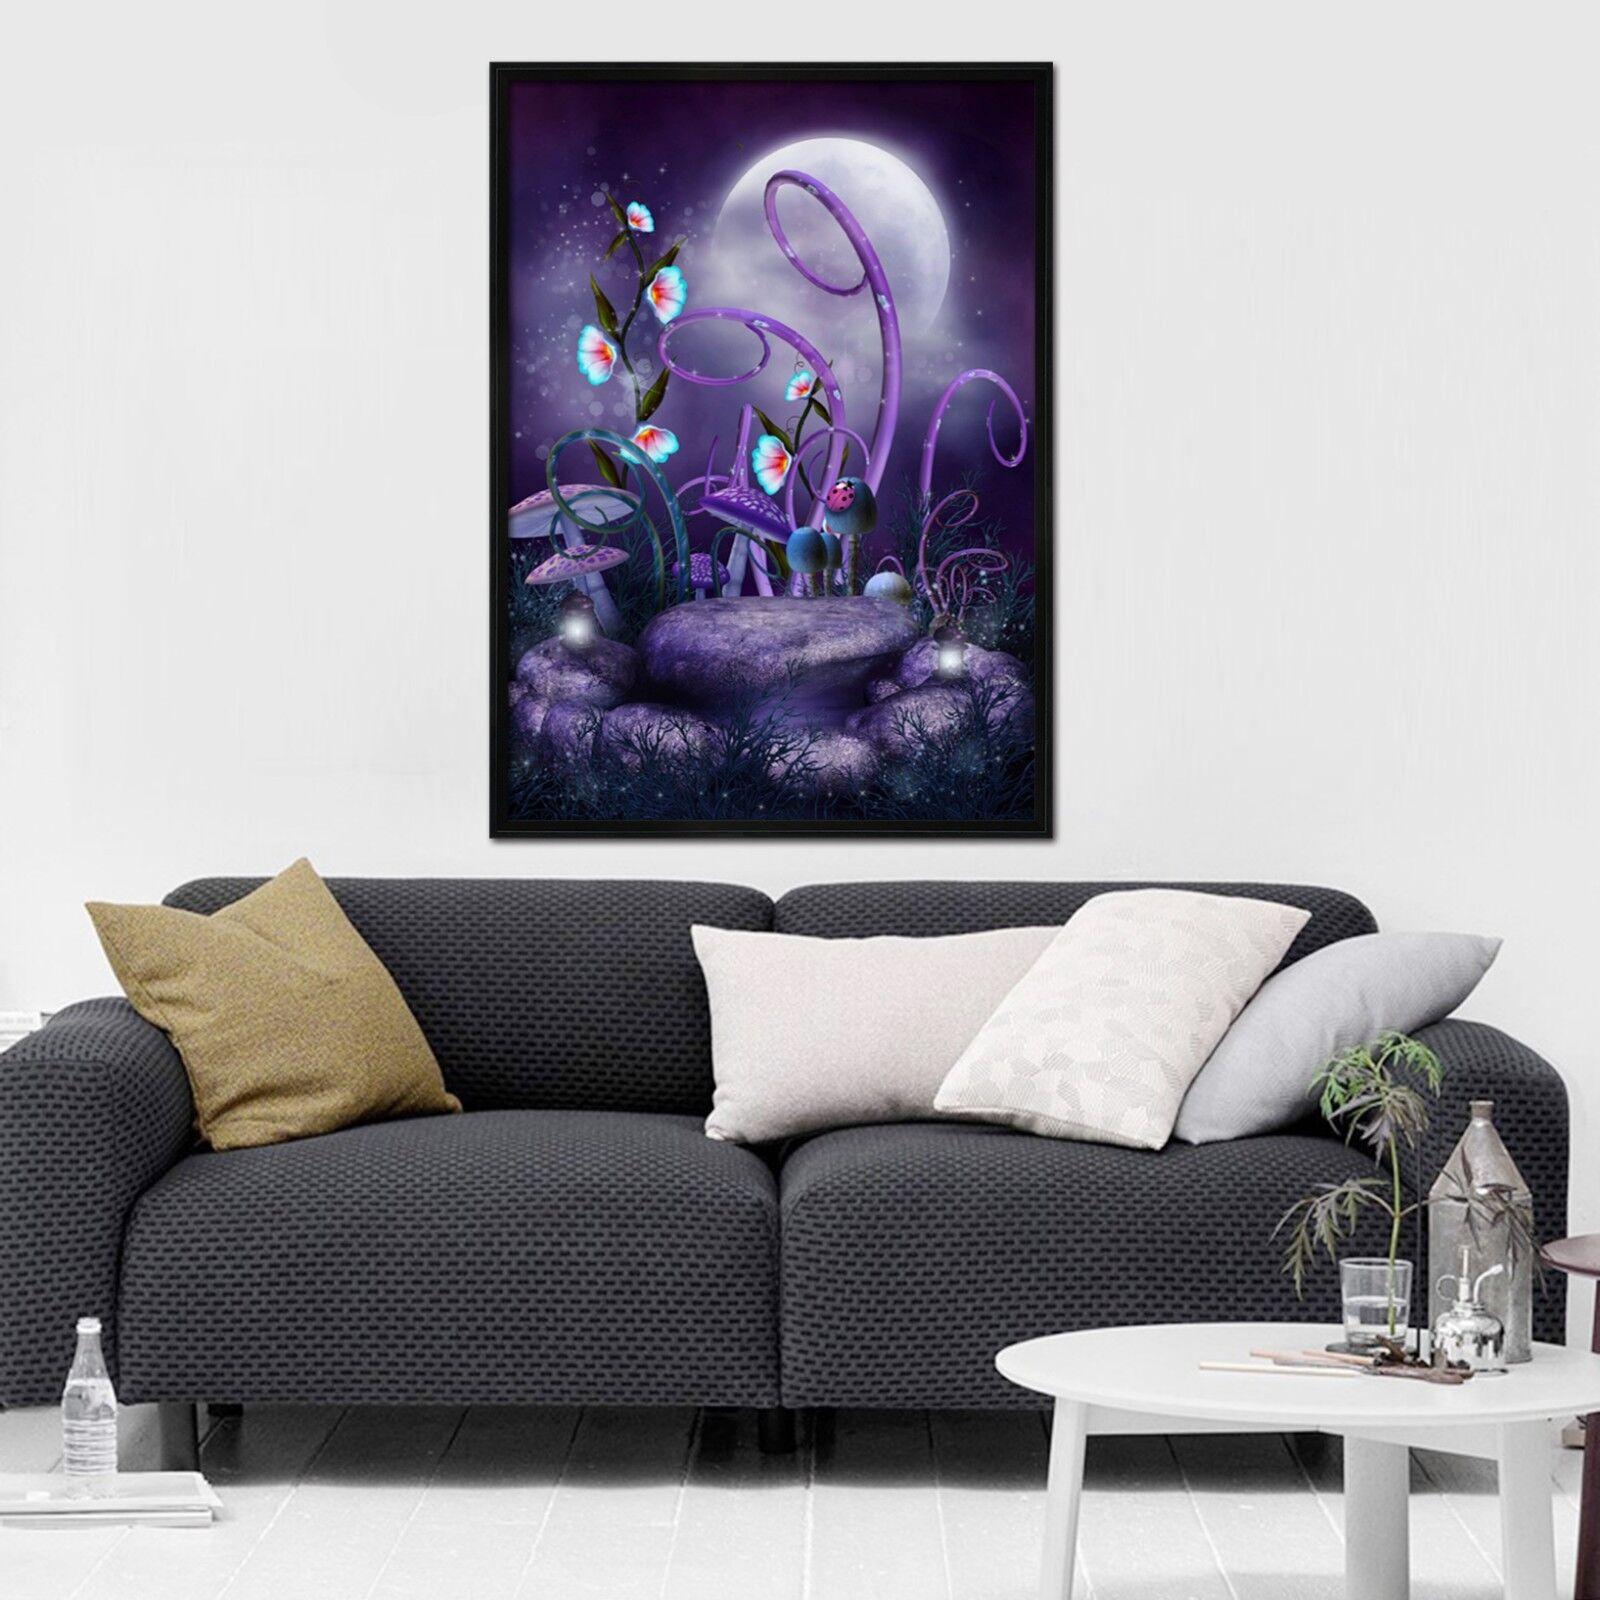 3D Lila Mond Wald  3 Gerahmt Poster Daheim Dekor Drucken Malerei Kunst AJ DE